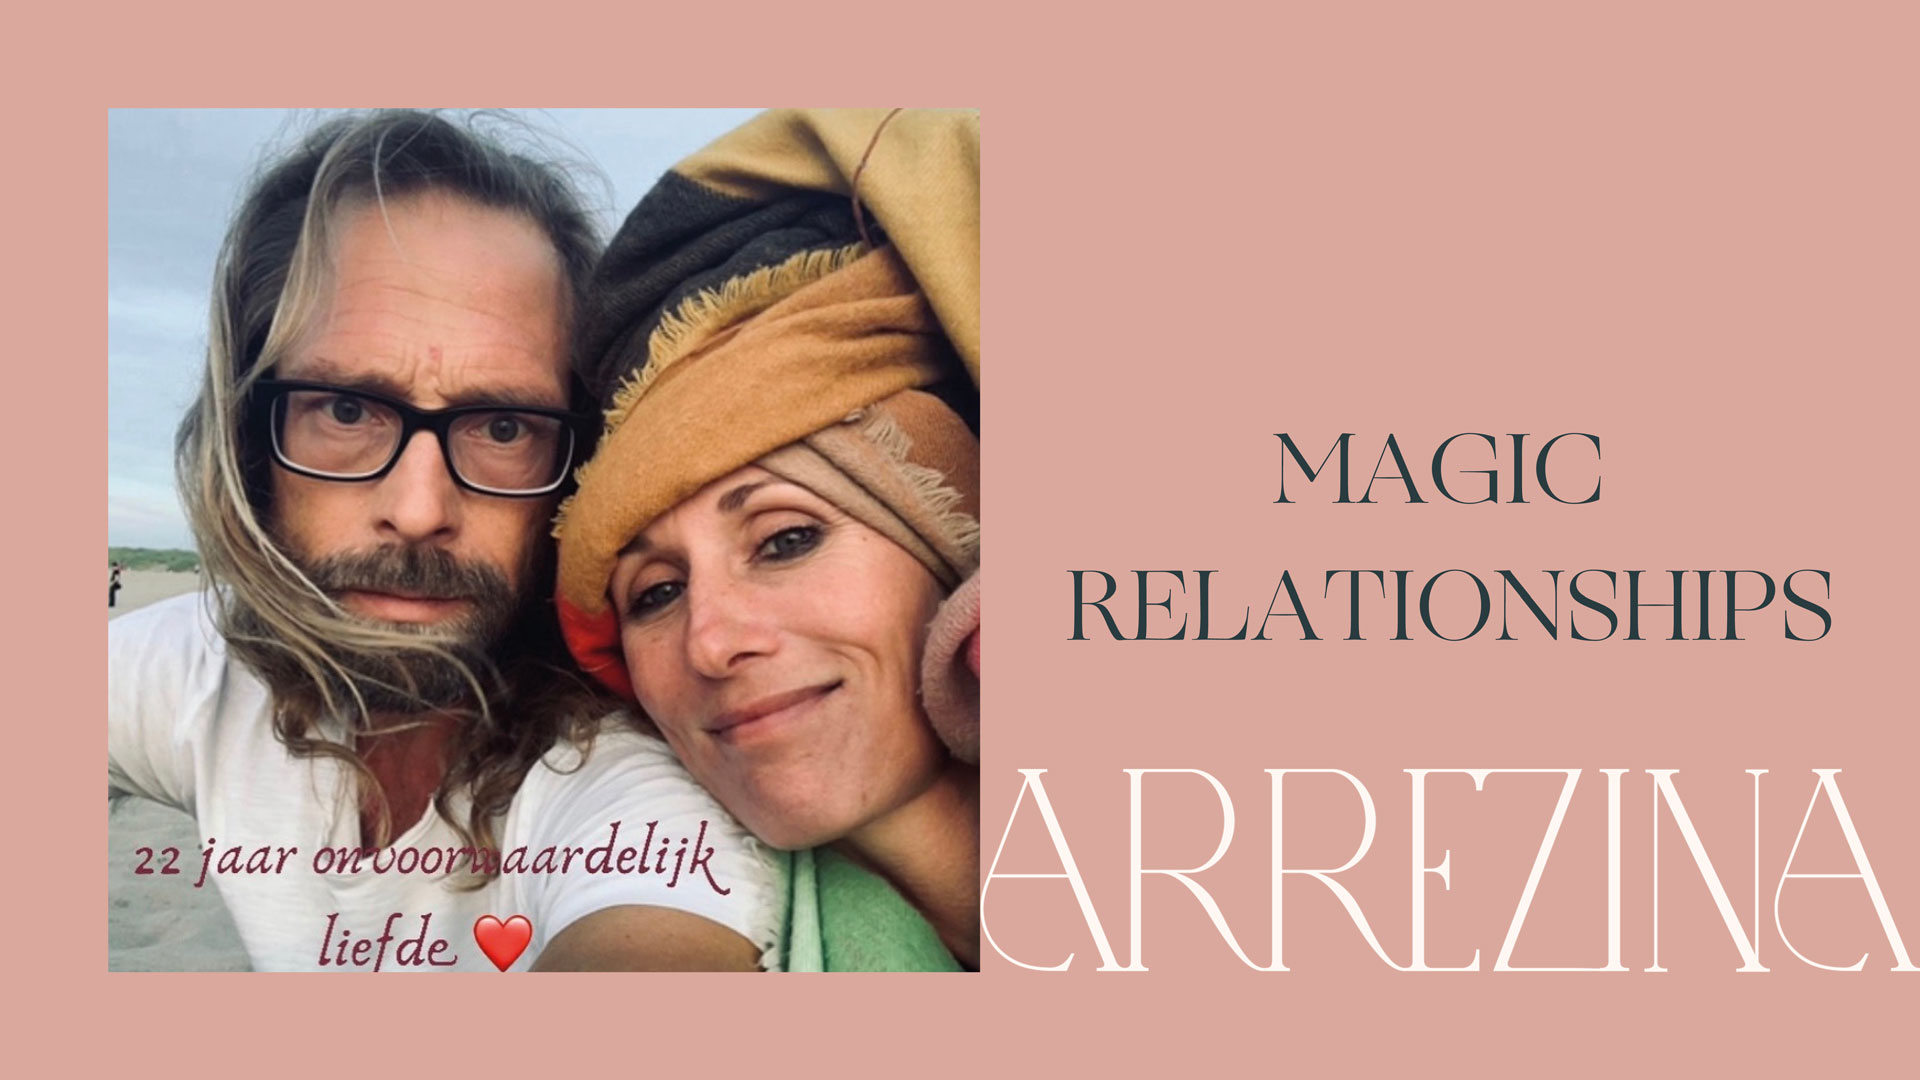 Bonus: Magic relationships